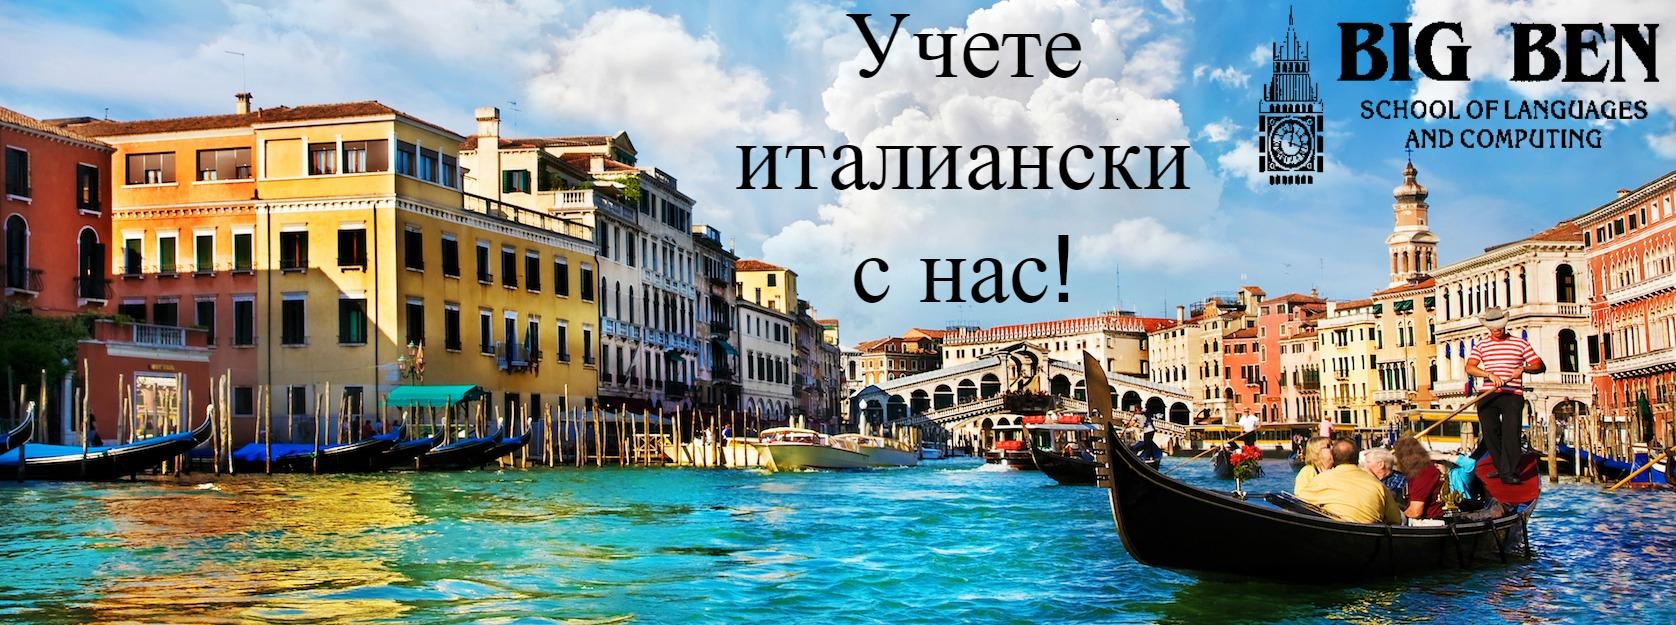 learn-italian-langauge-immersion-language-travel